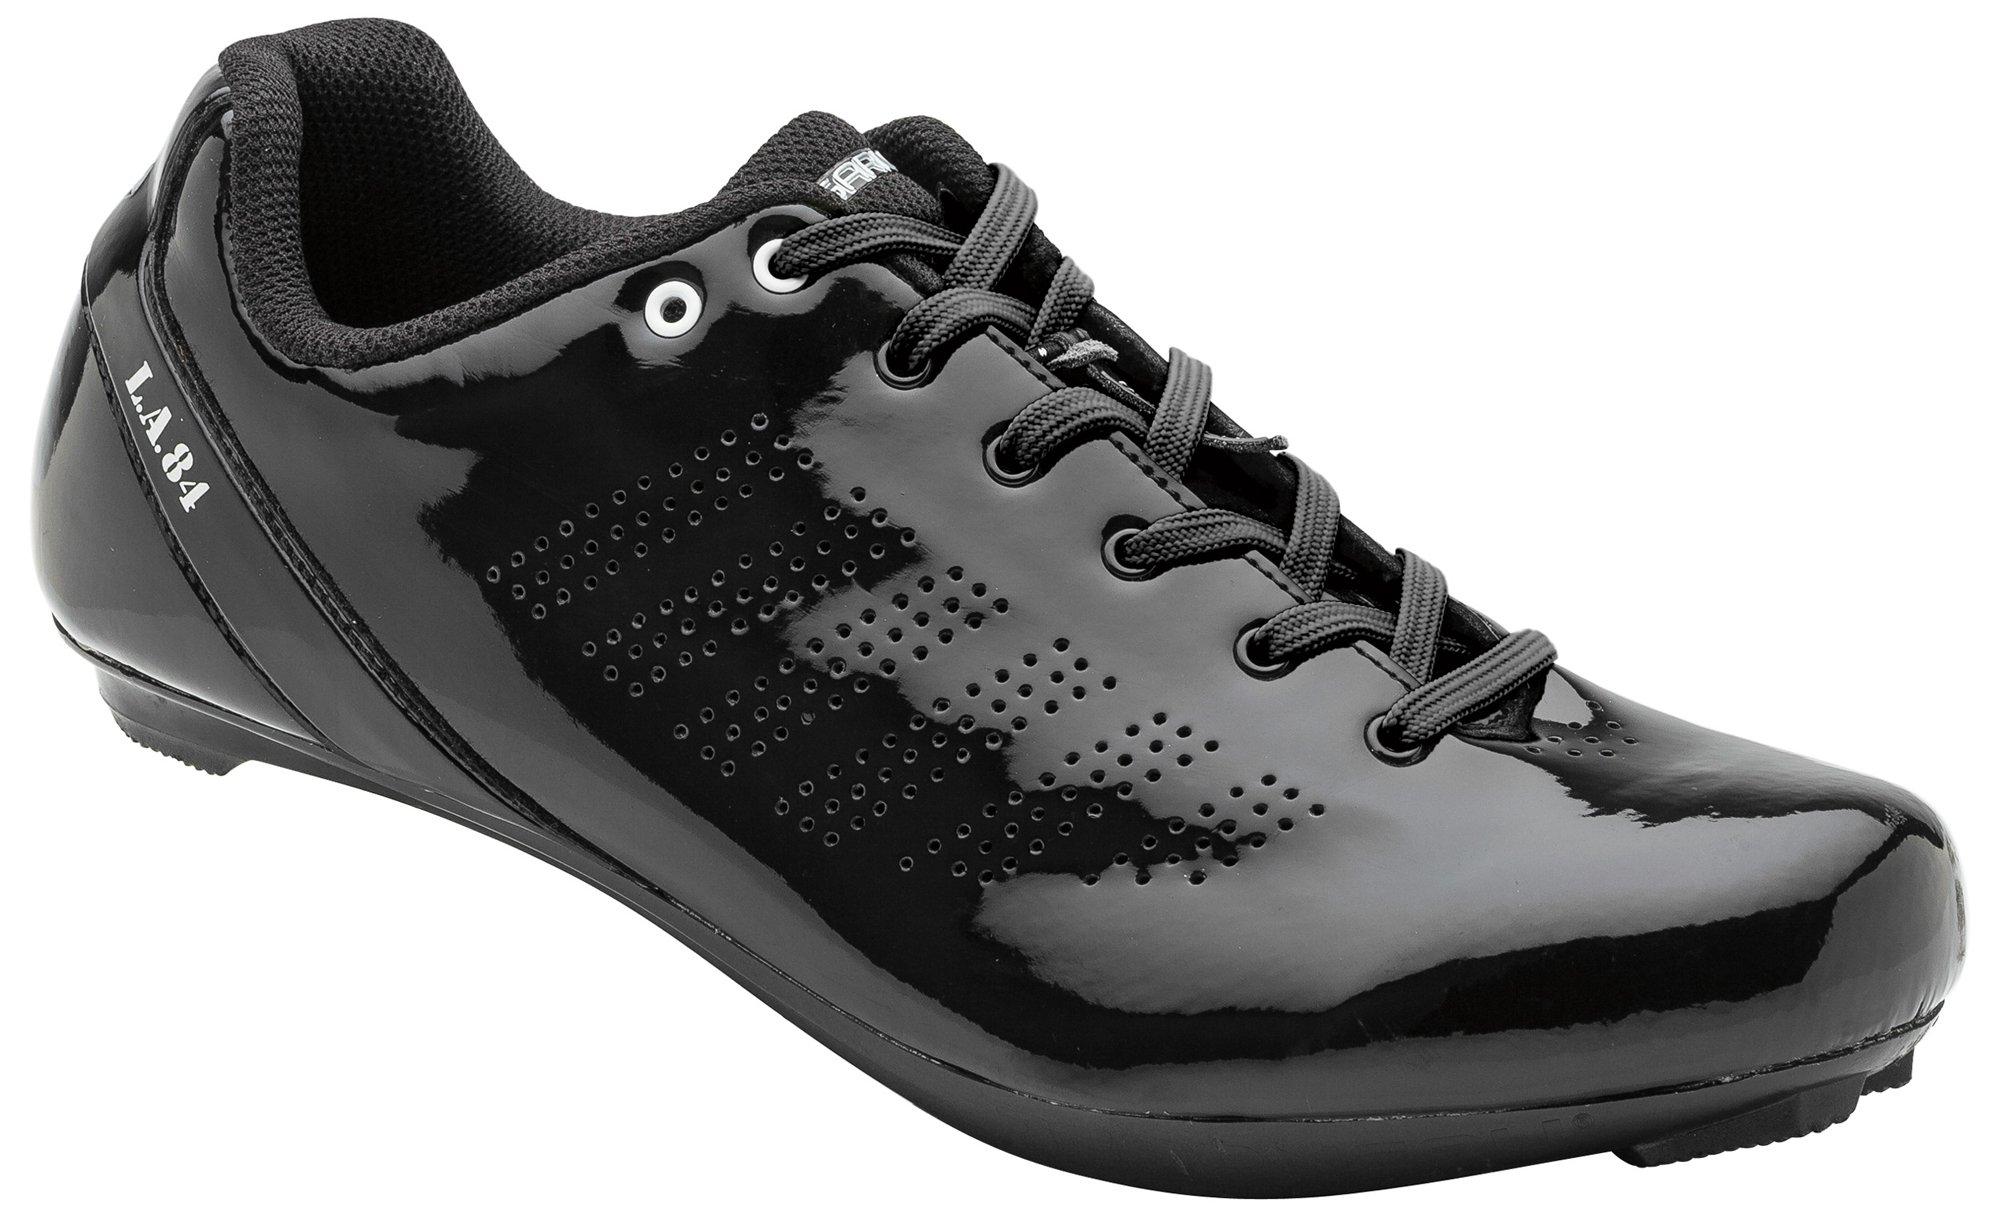 Louis Garneau - L.A. 84 Bike Shoes, Black, US (12), EU (47)